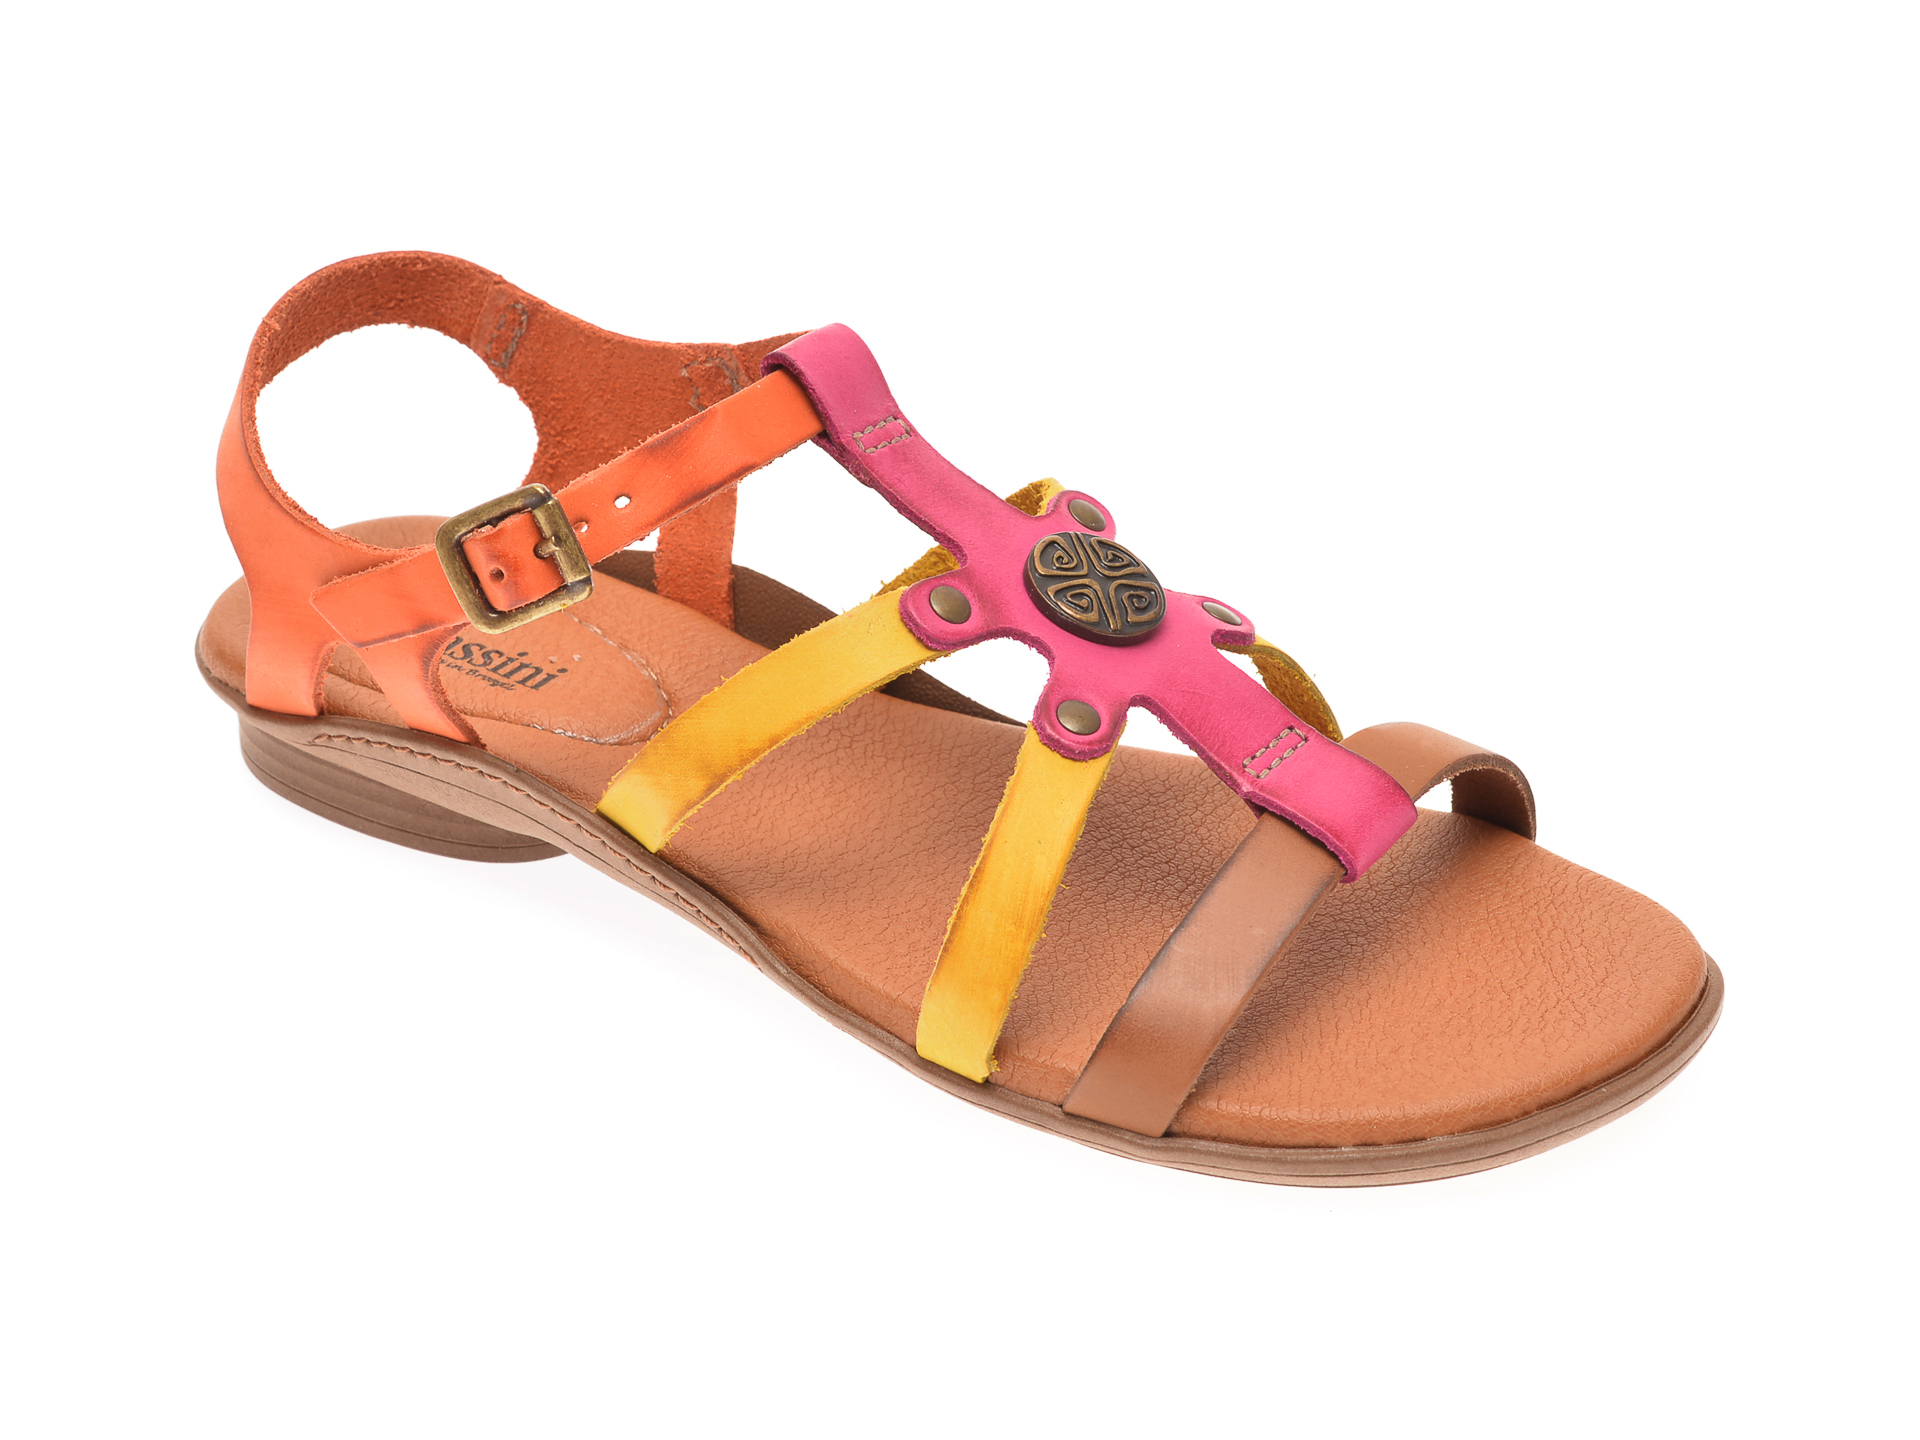 Sandale FLAVIA PASSINI multicolor, 37306, din piele naturala